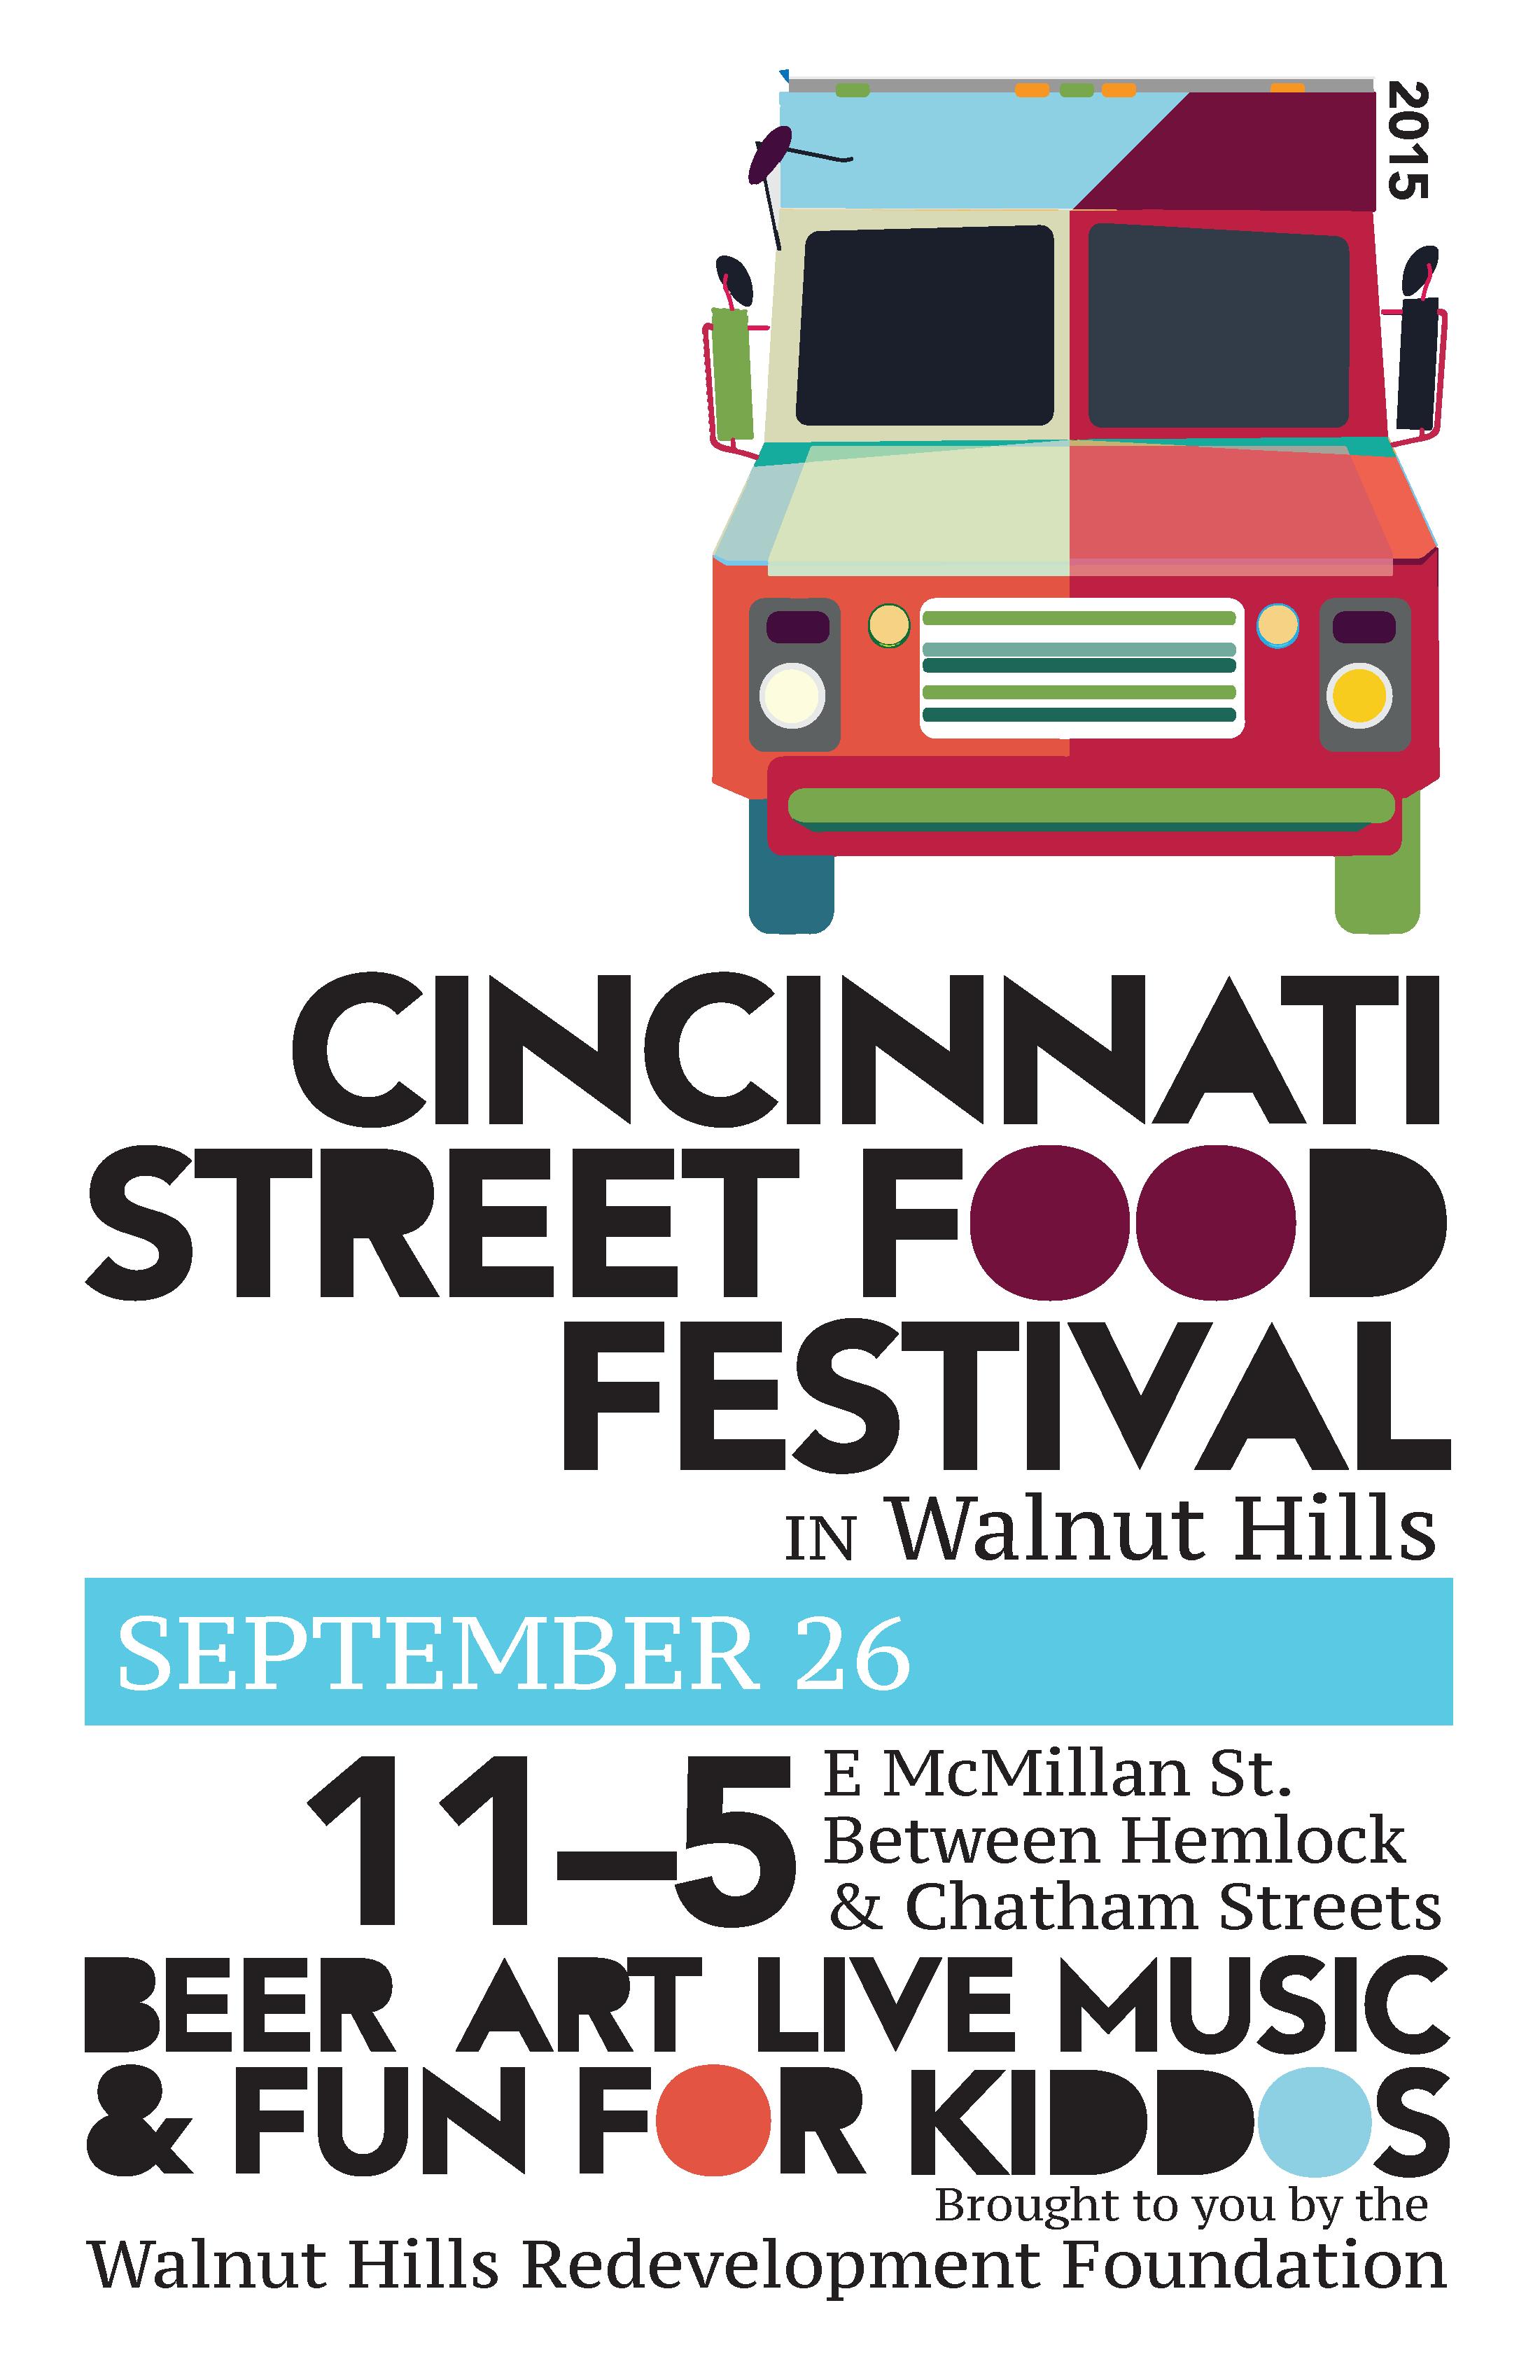 Cincinnati Street Food Festival (2015)